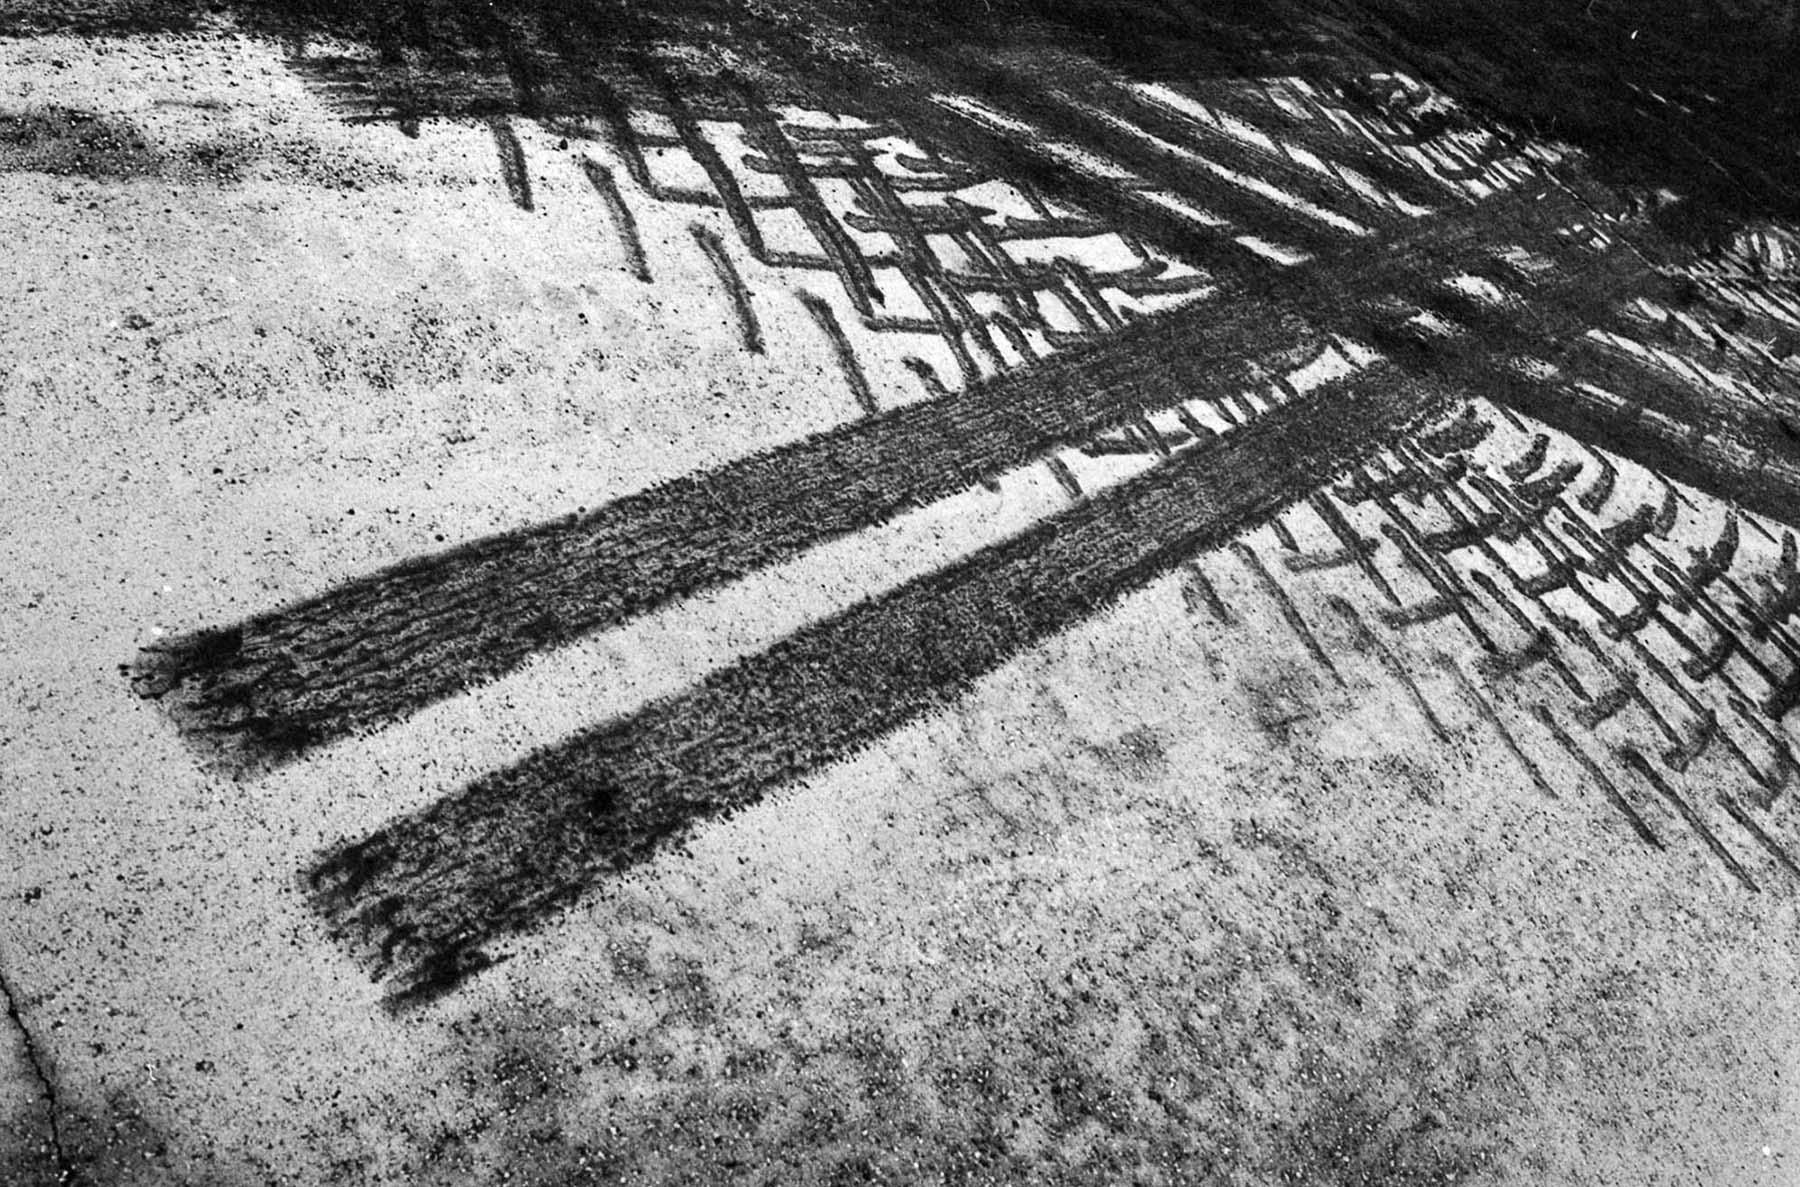 Crossroads | Olympus xa3 | Nystedt